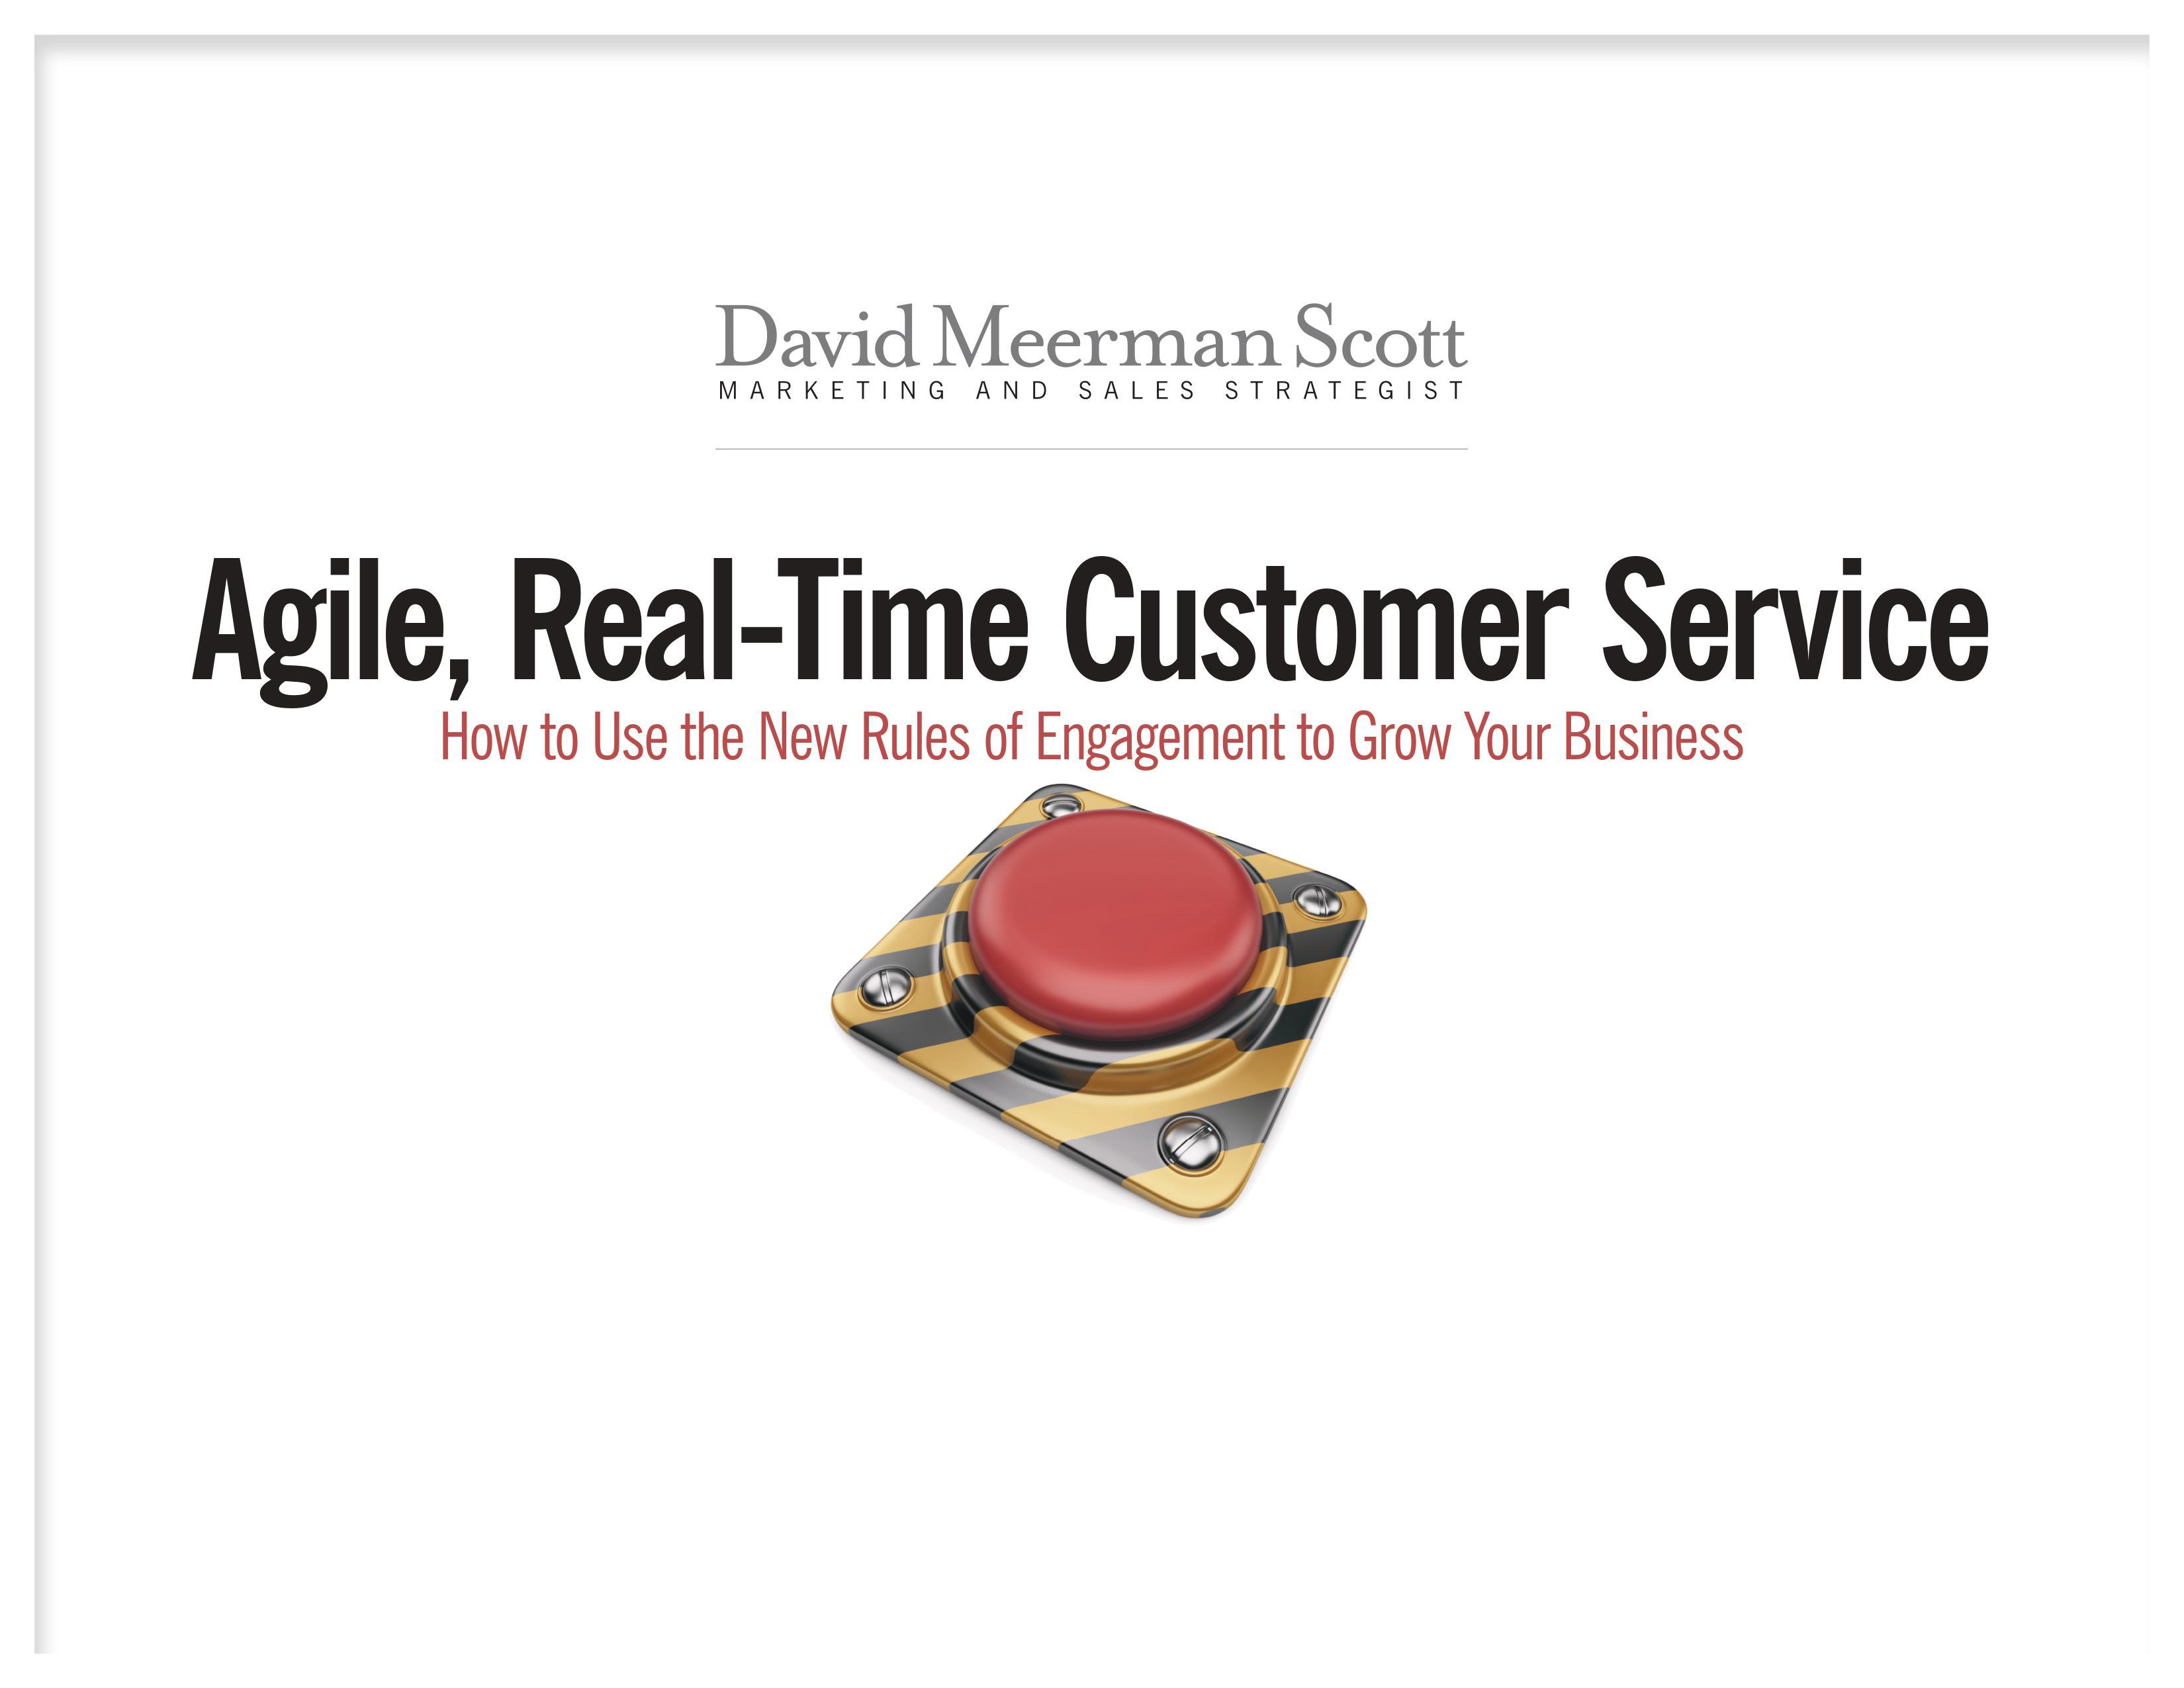 Agile, Real-Time Customer Service